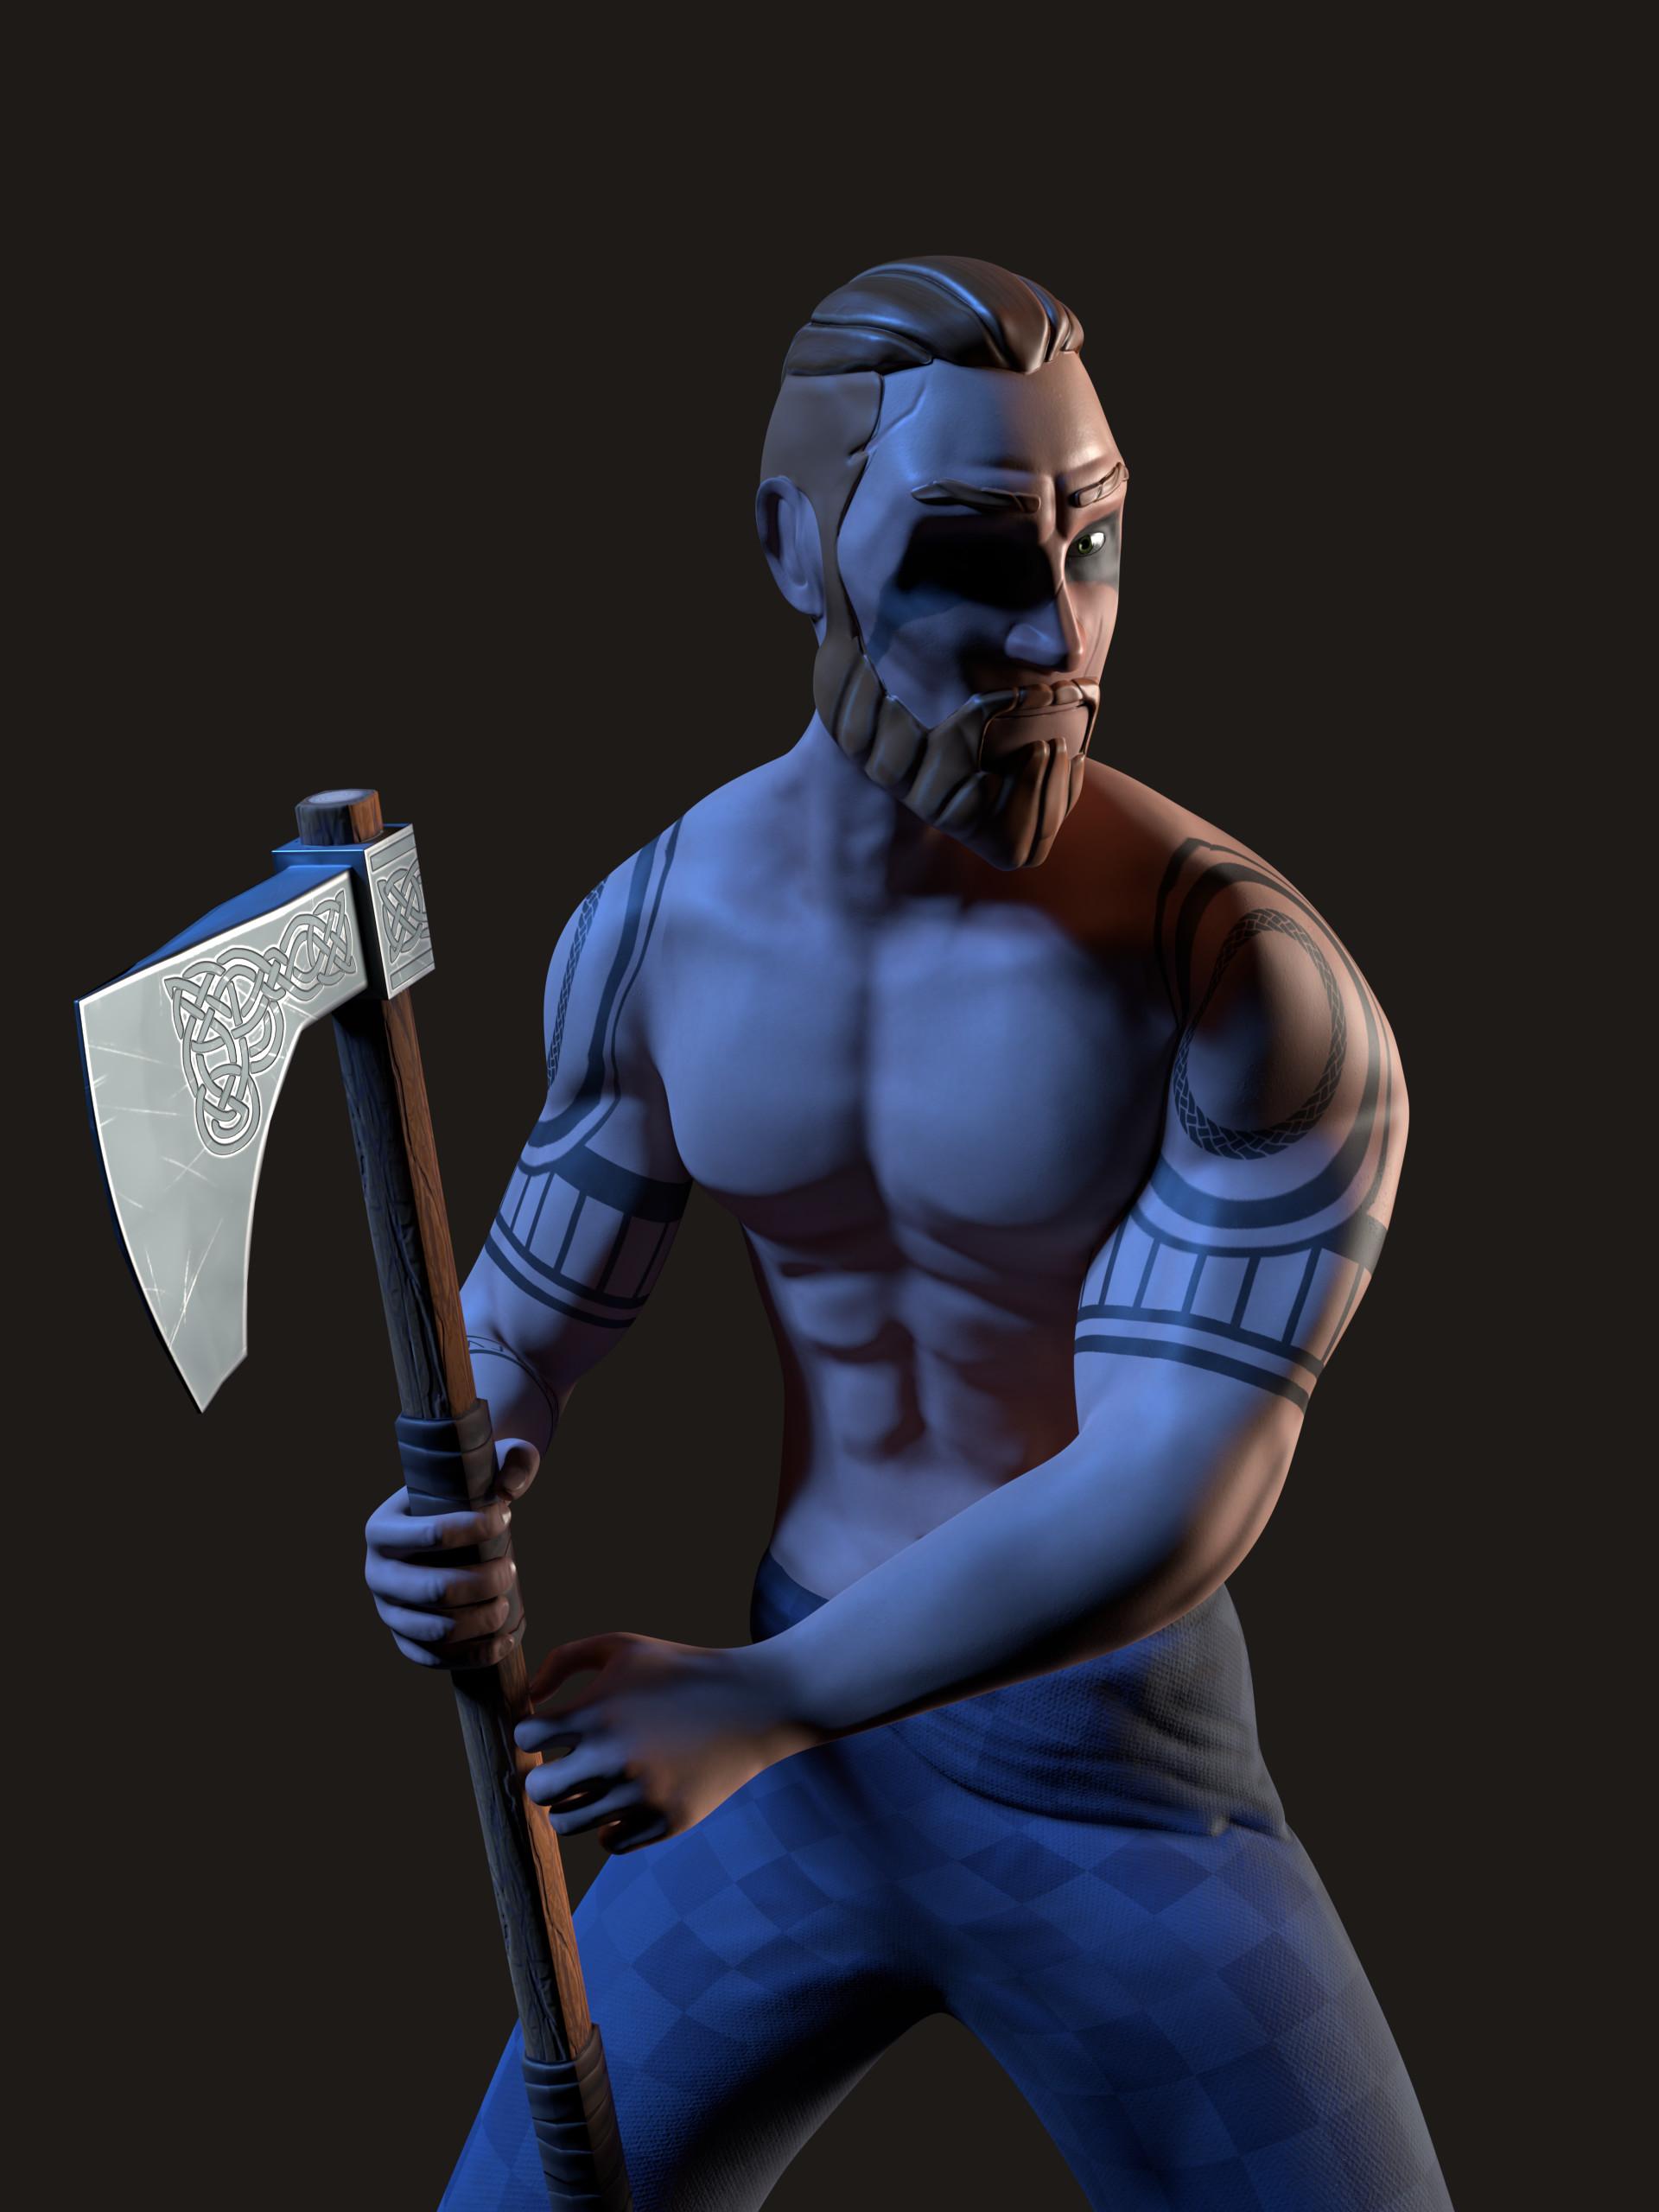 Kalani strange celtic warrior 6